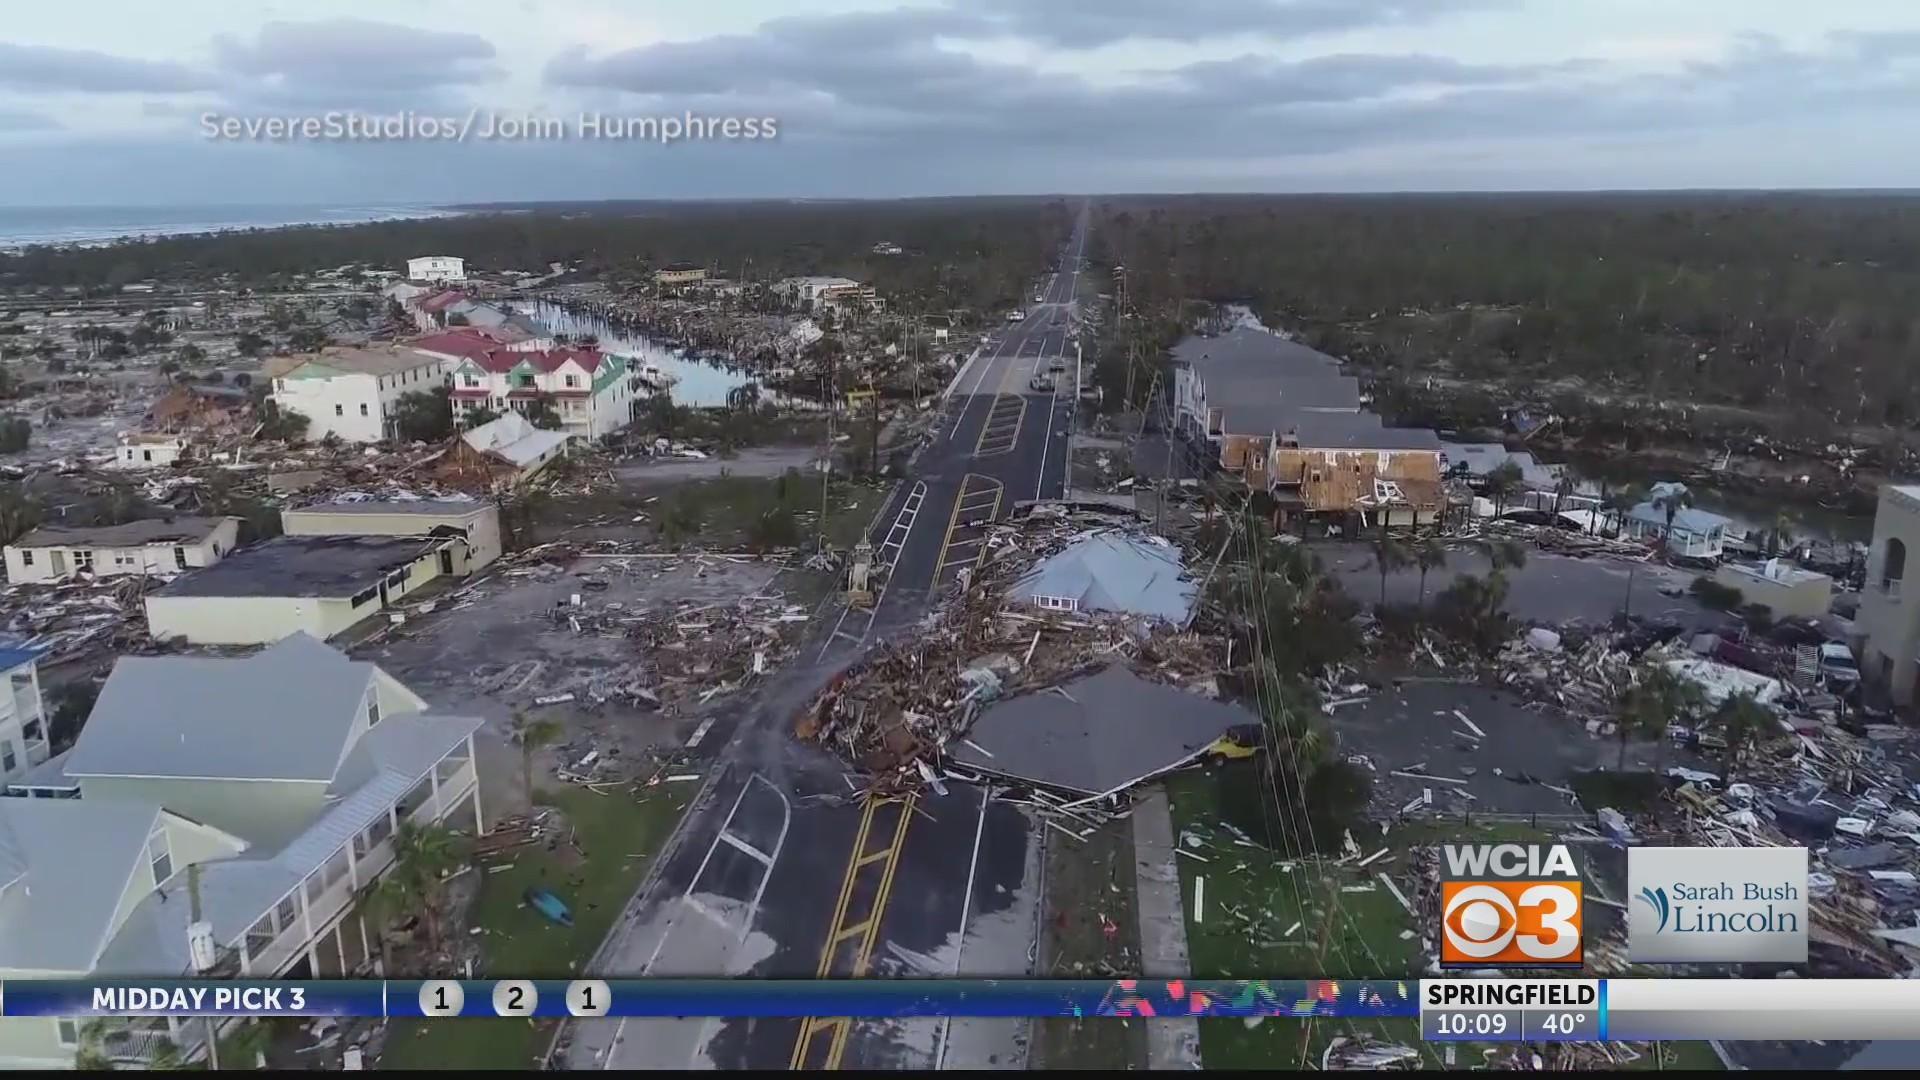 hurricane_relief_donations_0_20181013031554